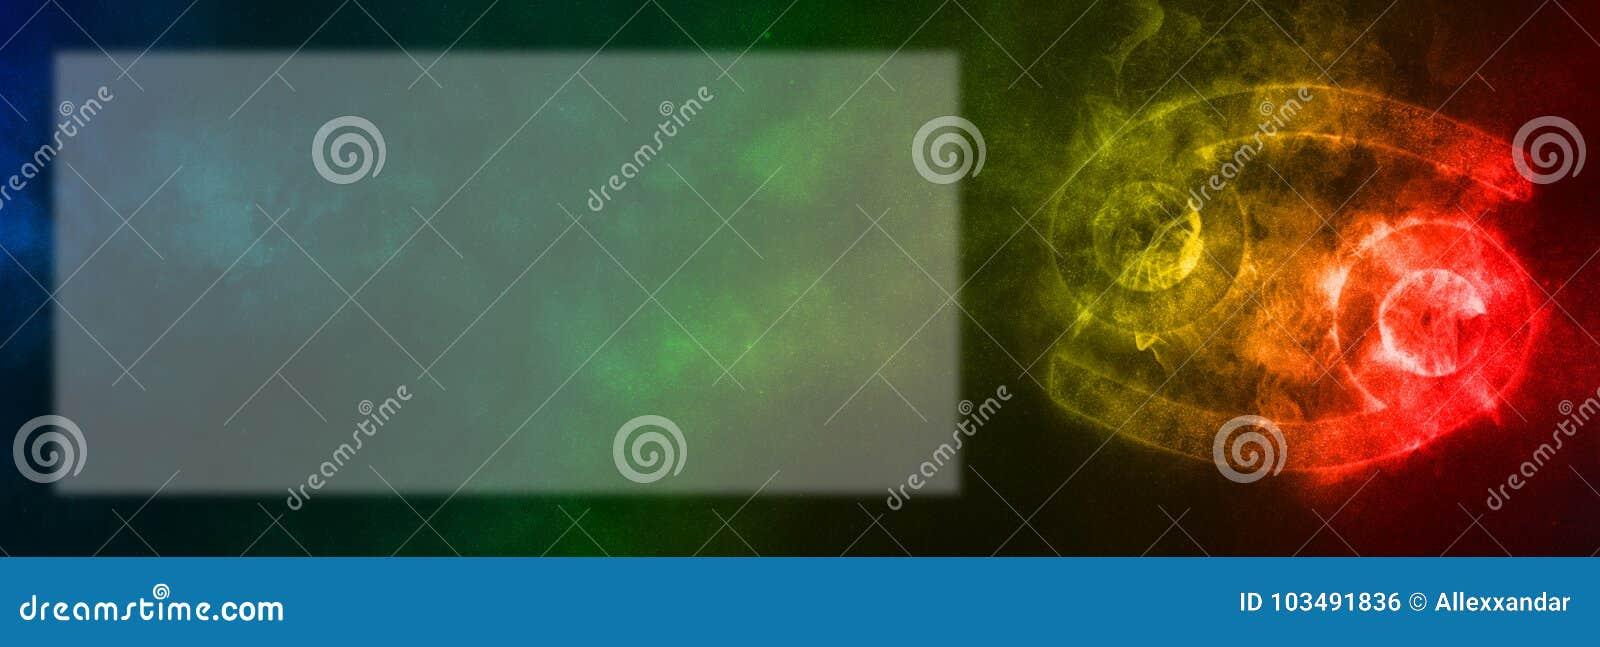 Zodiac καρκίνου σημάδι Σημάδι ωροσκοπίων καρκίνου Δωμάτιο κειμένων προτύπων